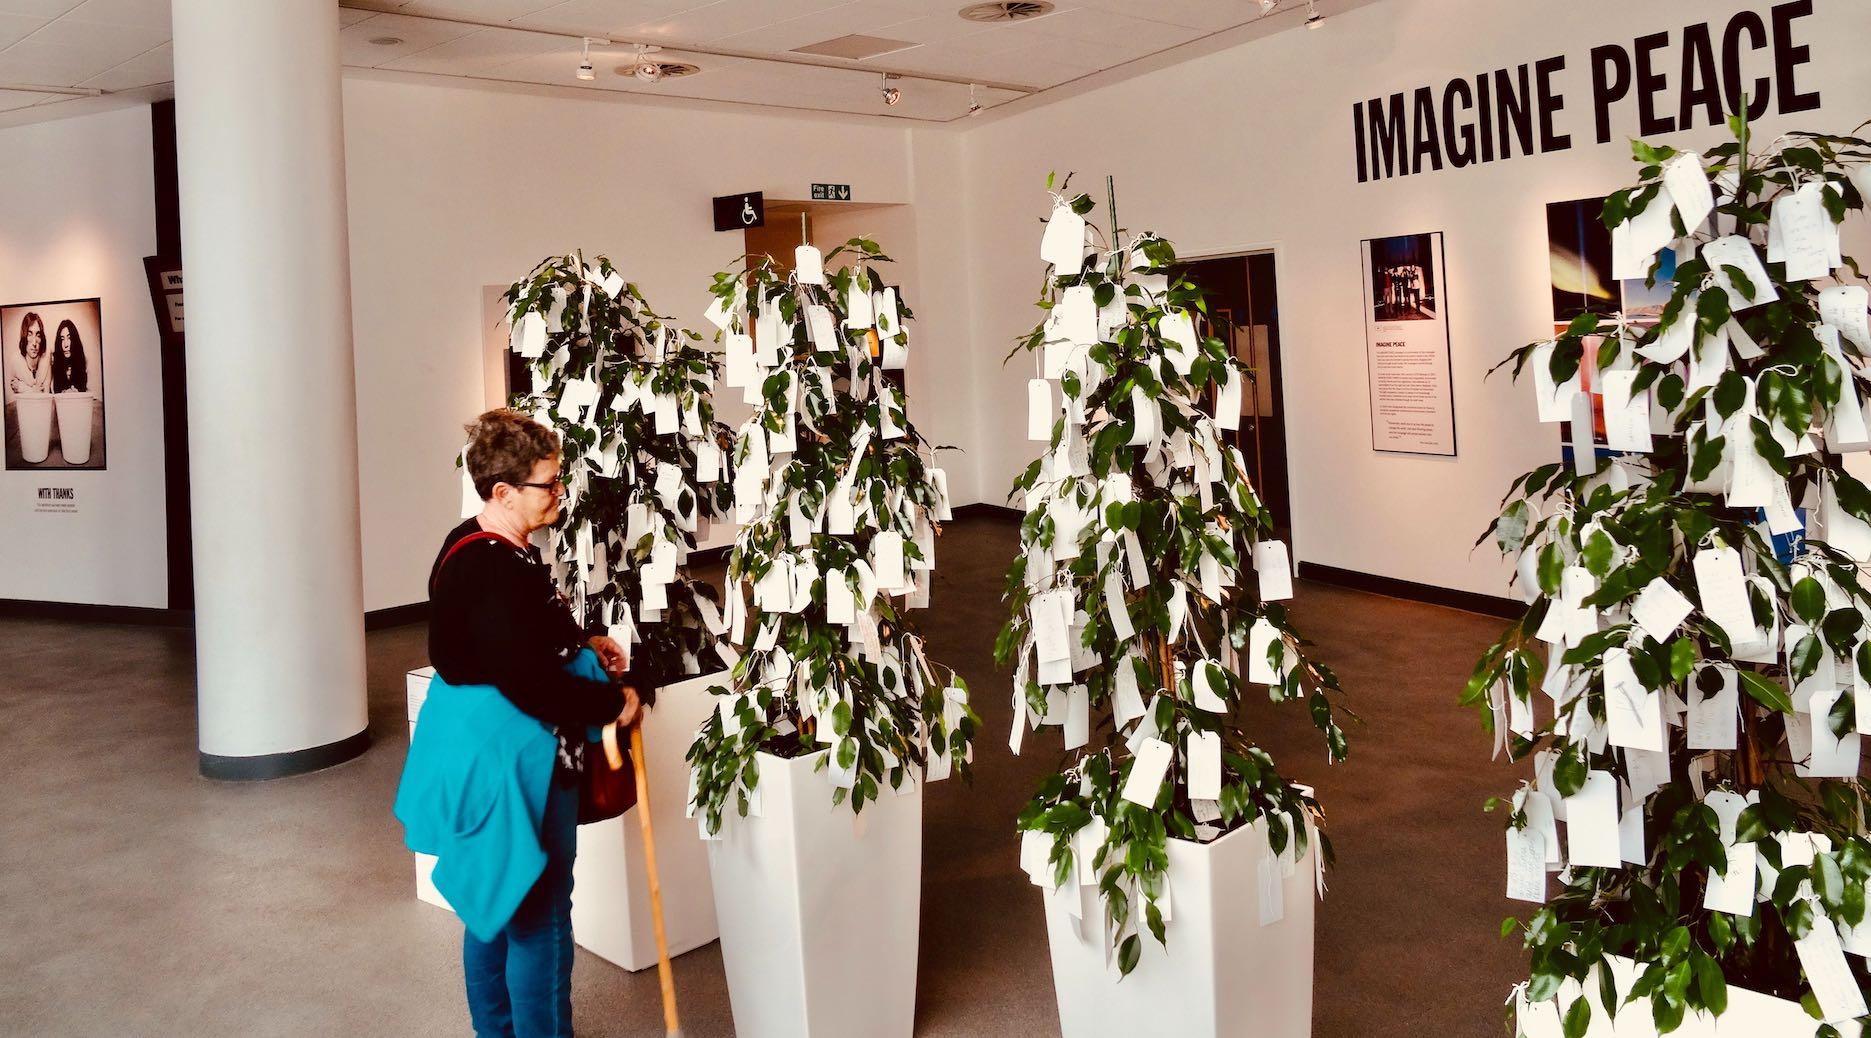 Yoko Ono's Imagine Peace Wish Trees